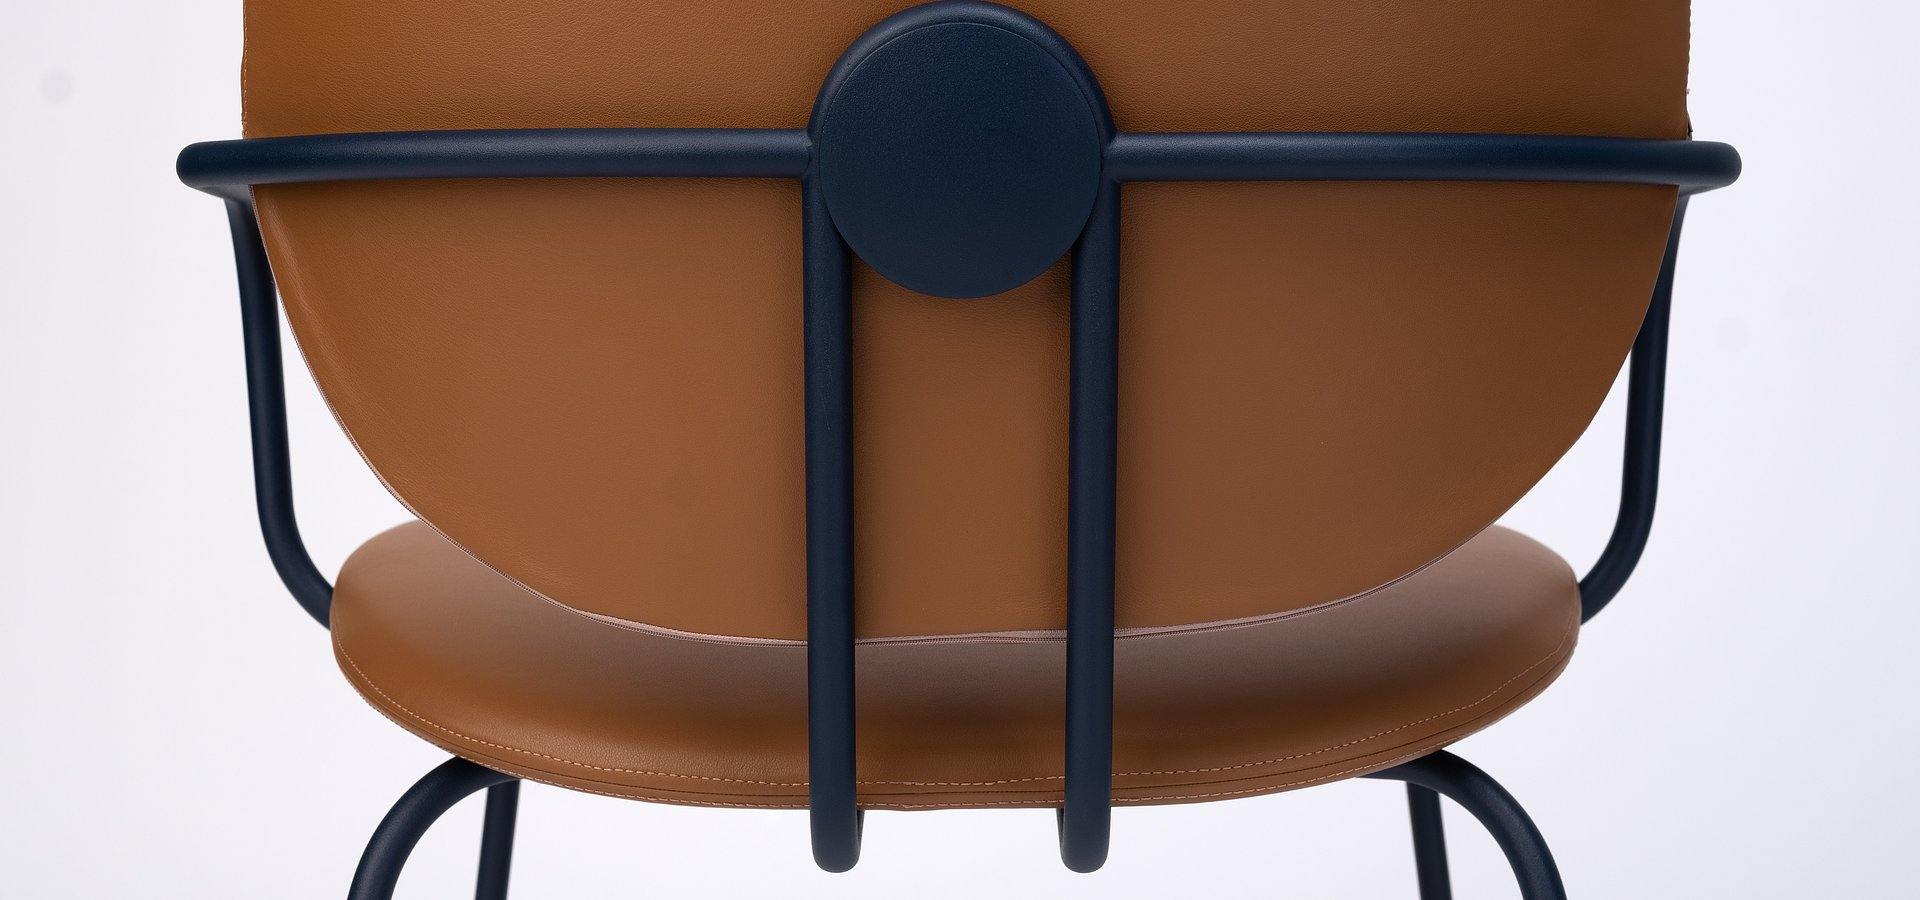 HARI Seating Collection